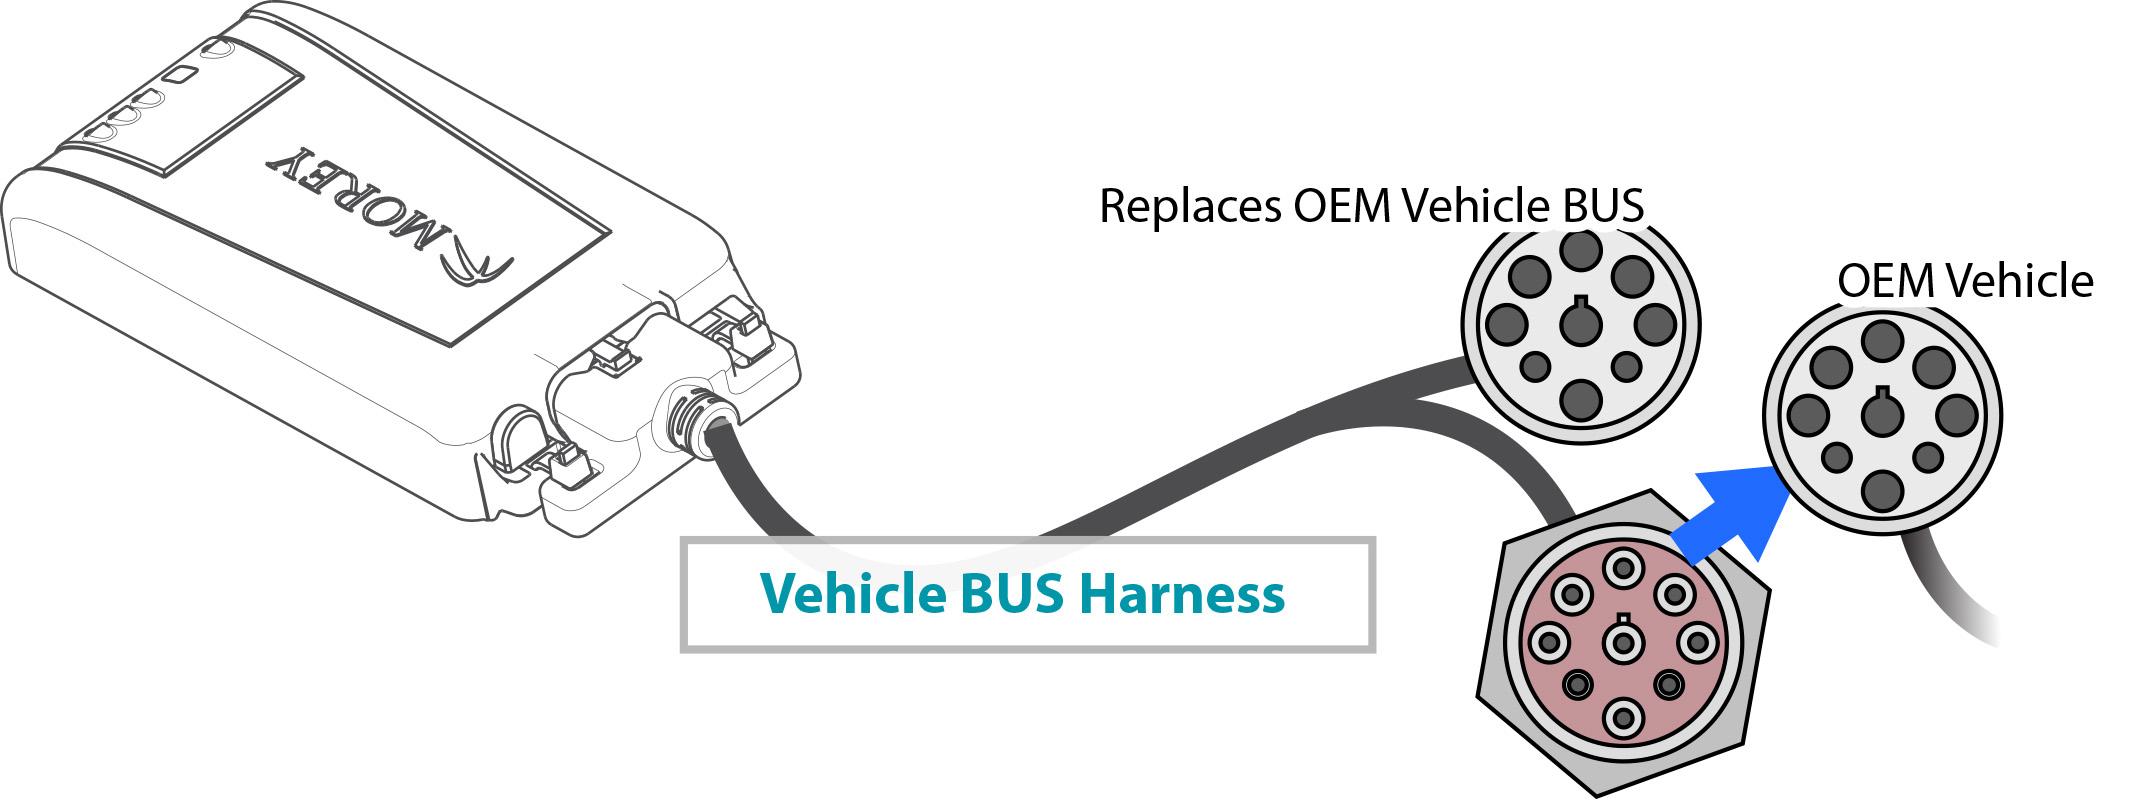 MC Vehicle BUS Harness Configuration